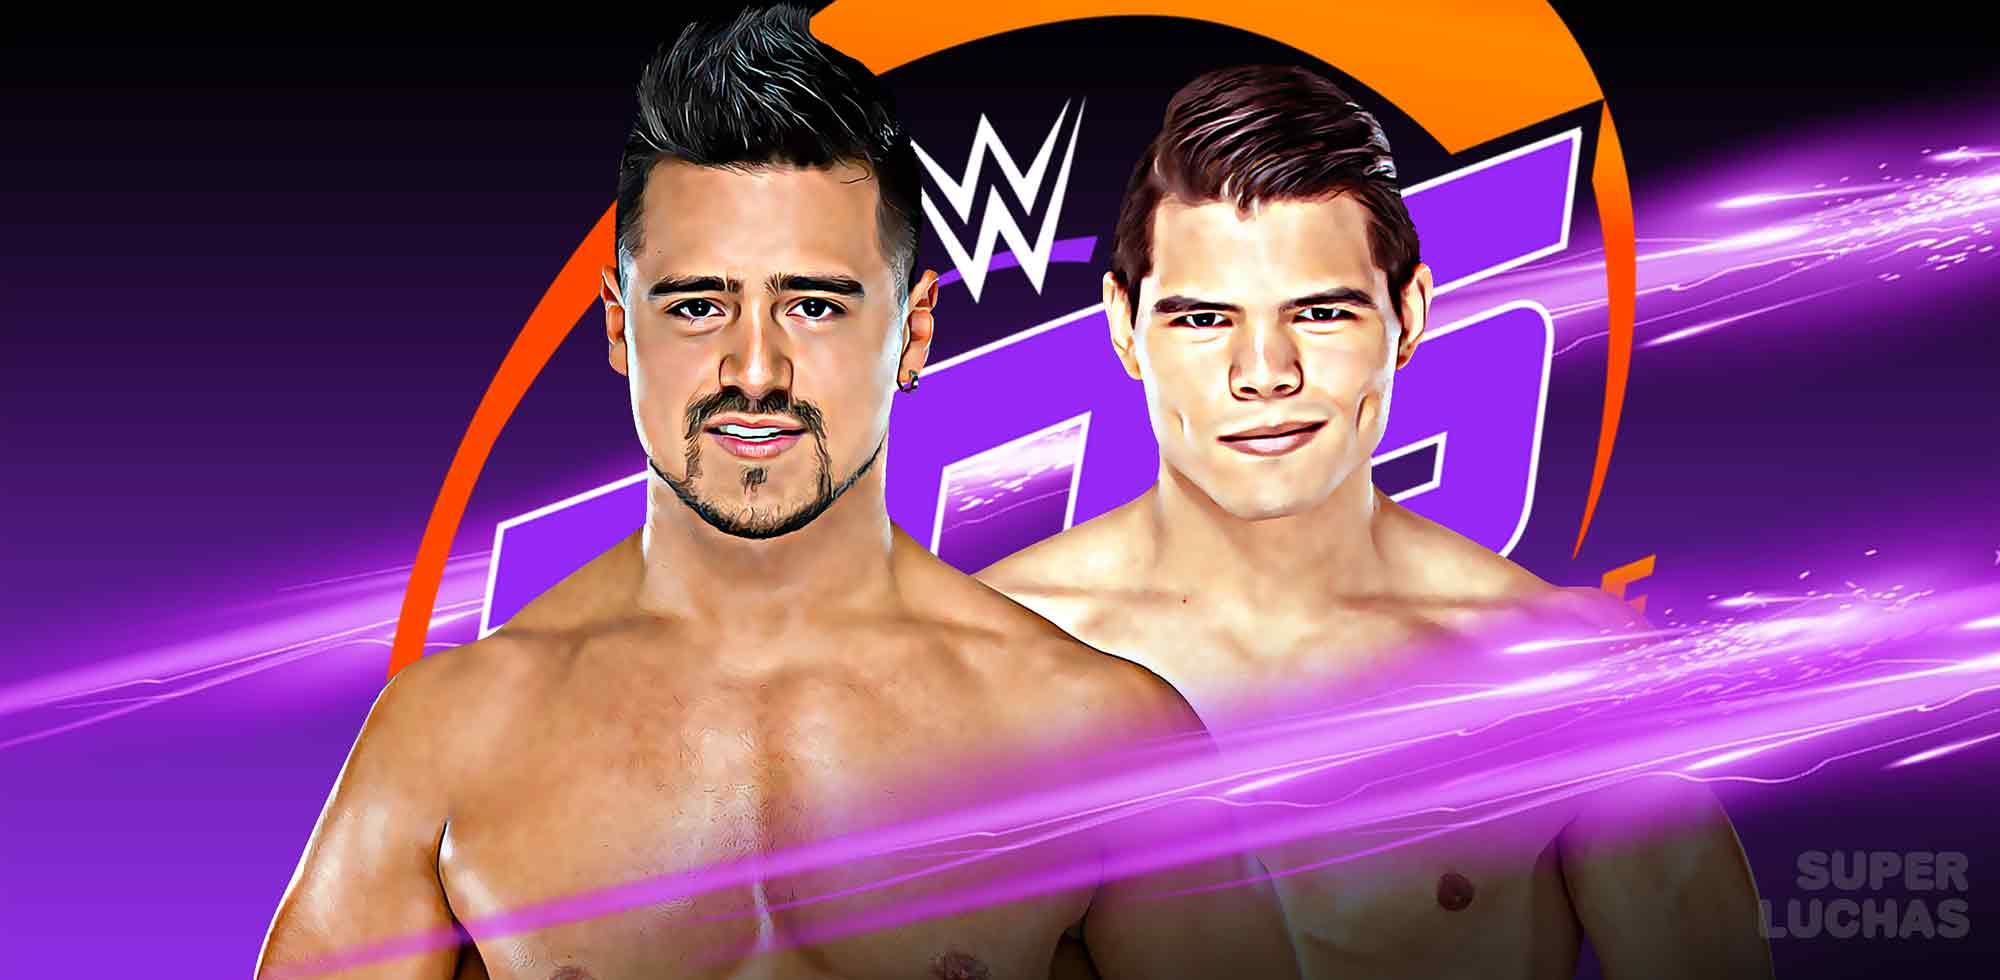 Cobertura WWE 205 Live 24 de septiembre de 2019